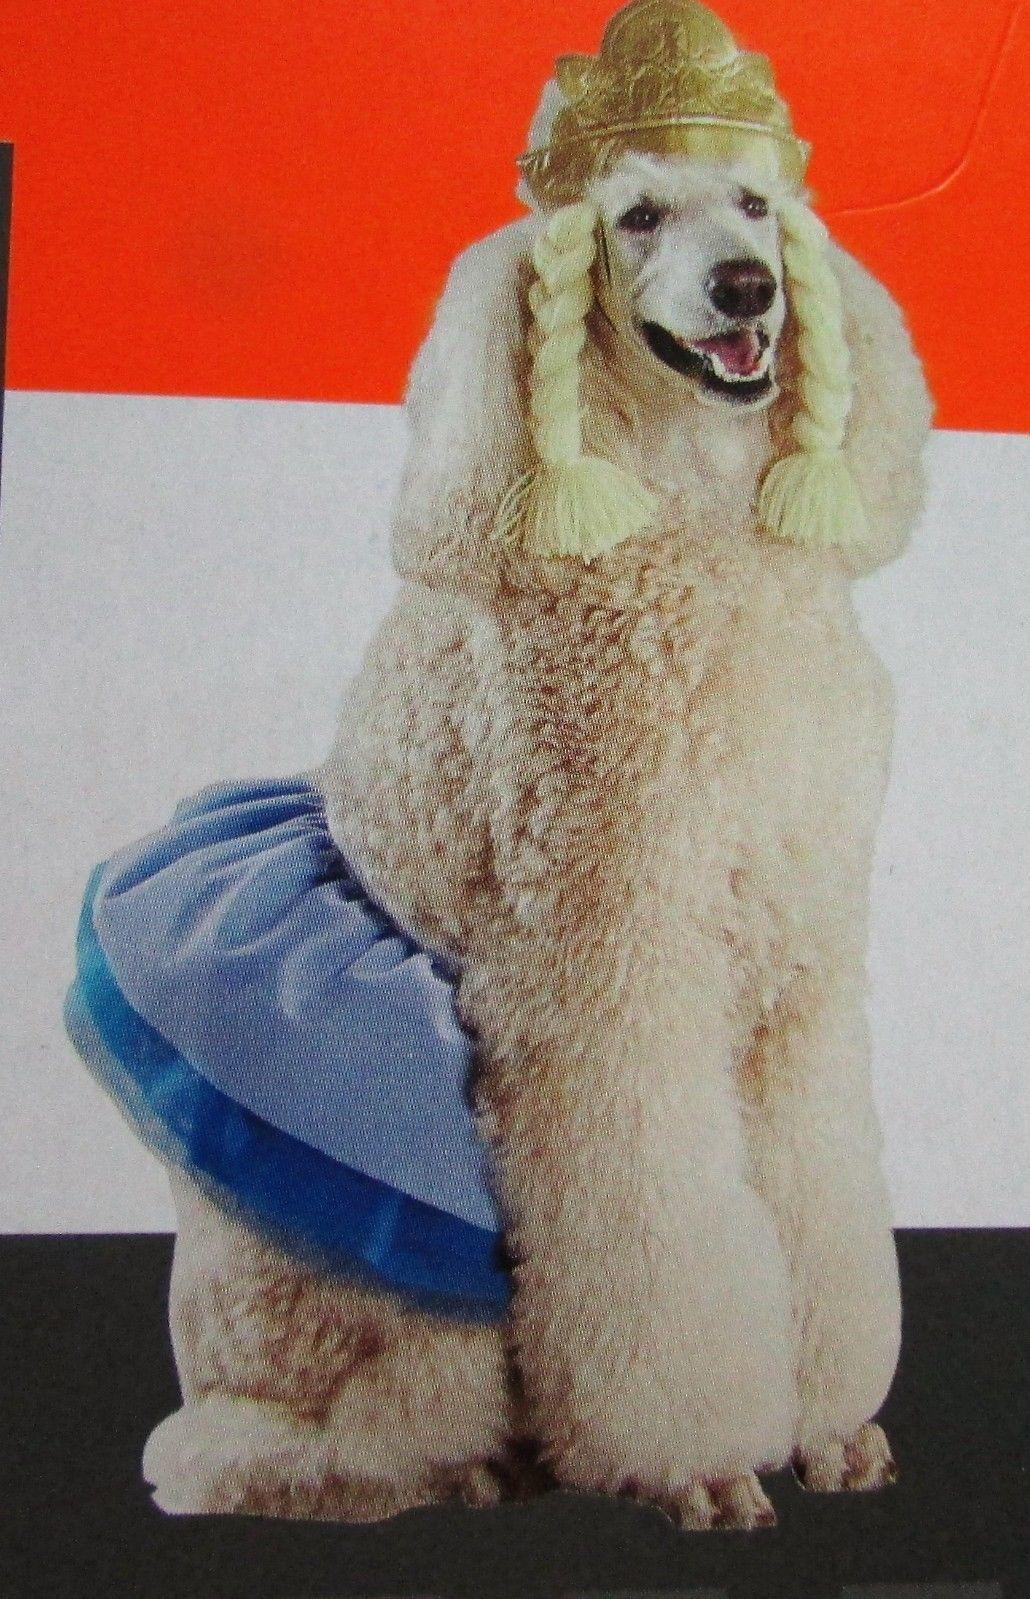 Princess Target Dog Costume Headband & Tutu Sz L/XL